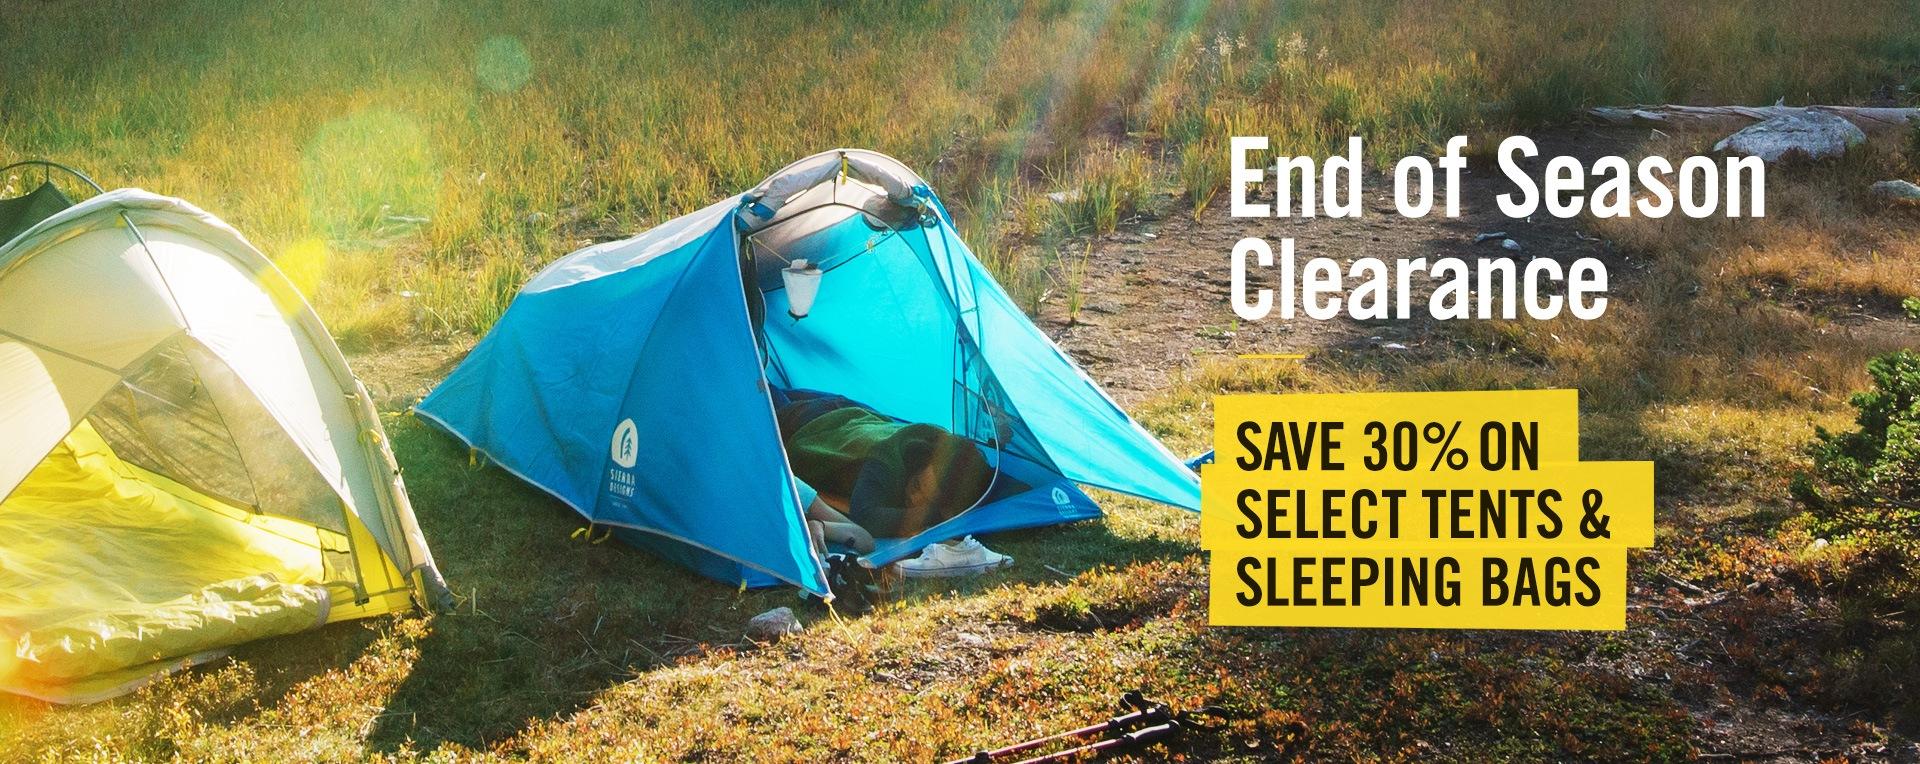 Save 30% on Select Tents & Sleeping Bags